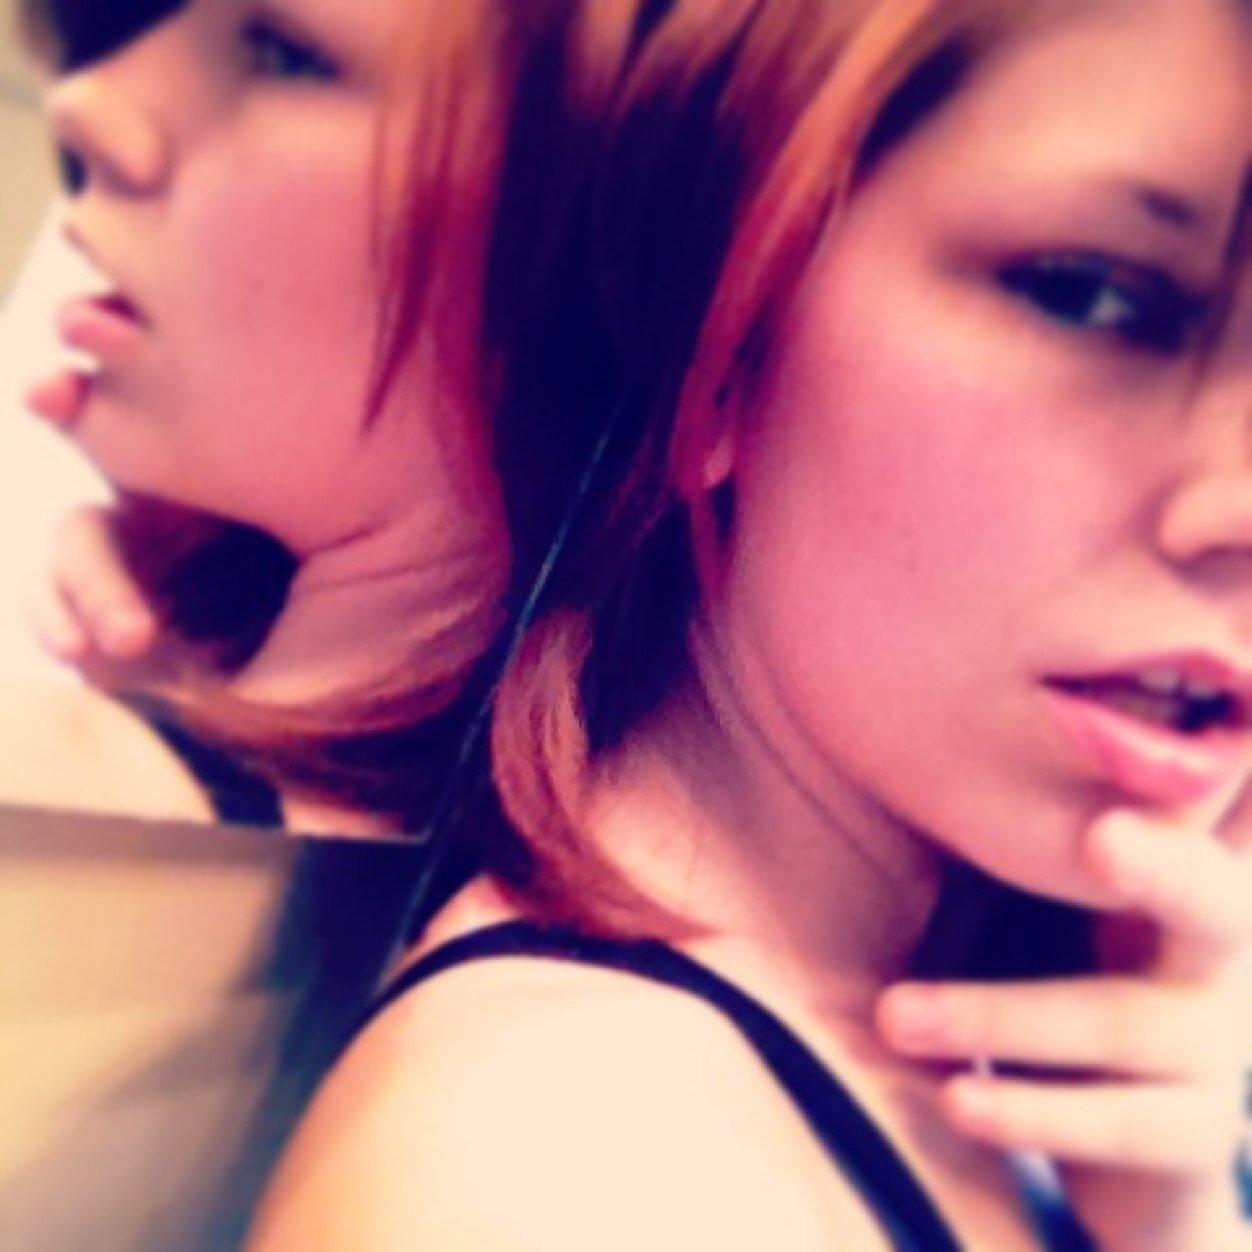 Shamili (Baby Shamili),Denise Miller Hot video Kathryn Hunter,Andrea Anders born May 10, 1975 (age 43)